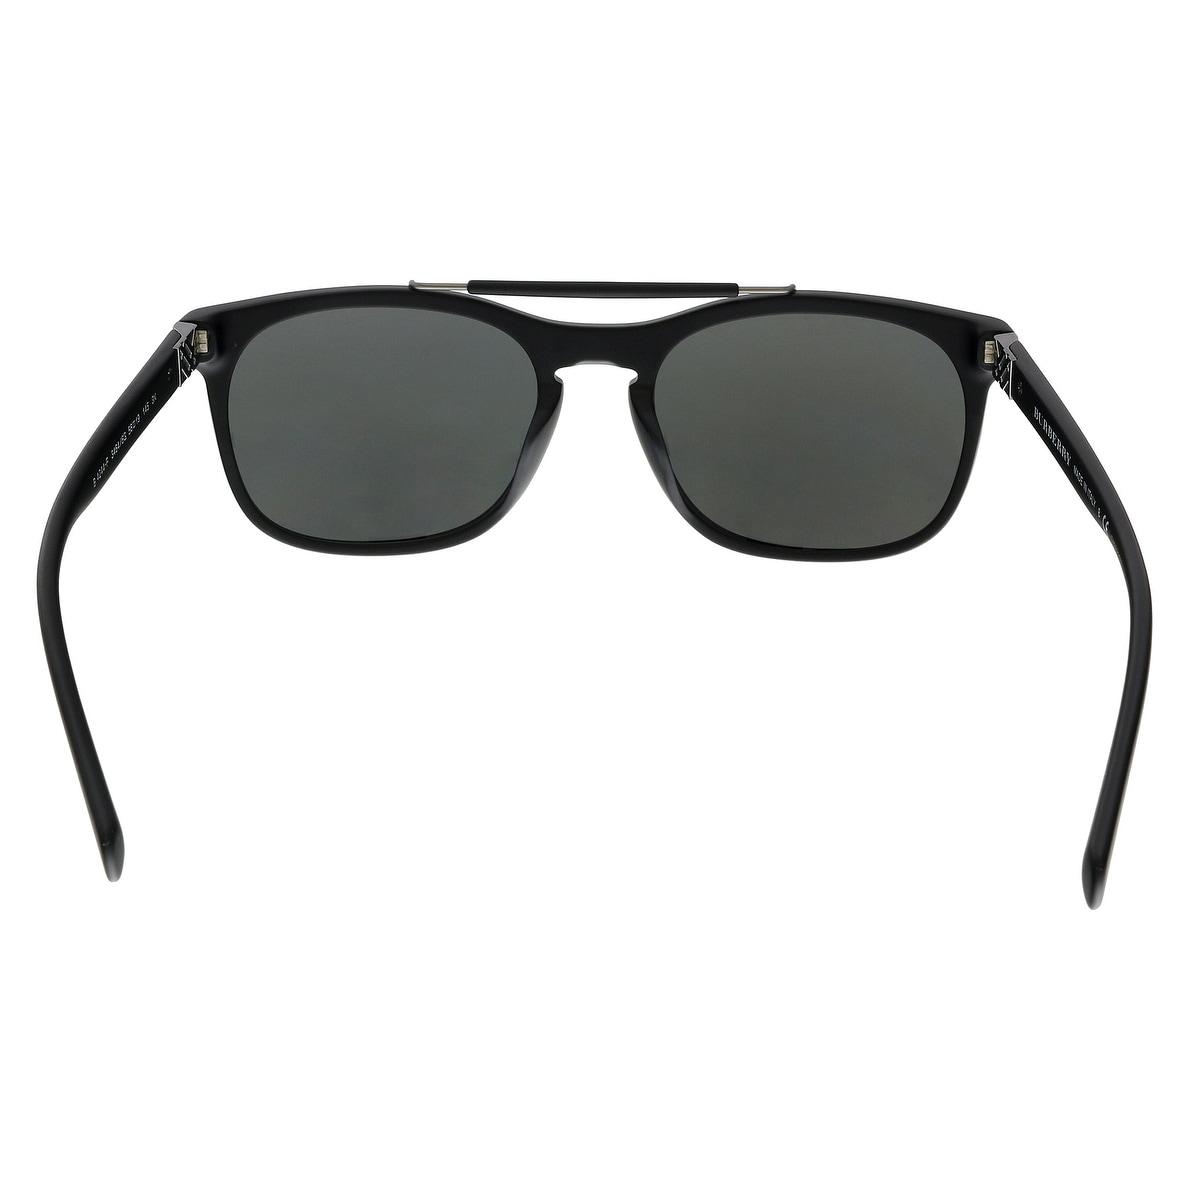 d1479a1d56e Shop Burberry BE4244 34646G Matte Black Rectangular Sunglasses - No Size -  Free Shipping Today - Overstock - 24081514